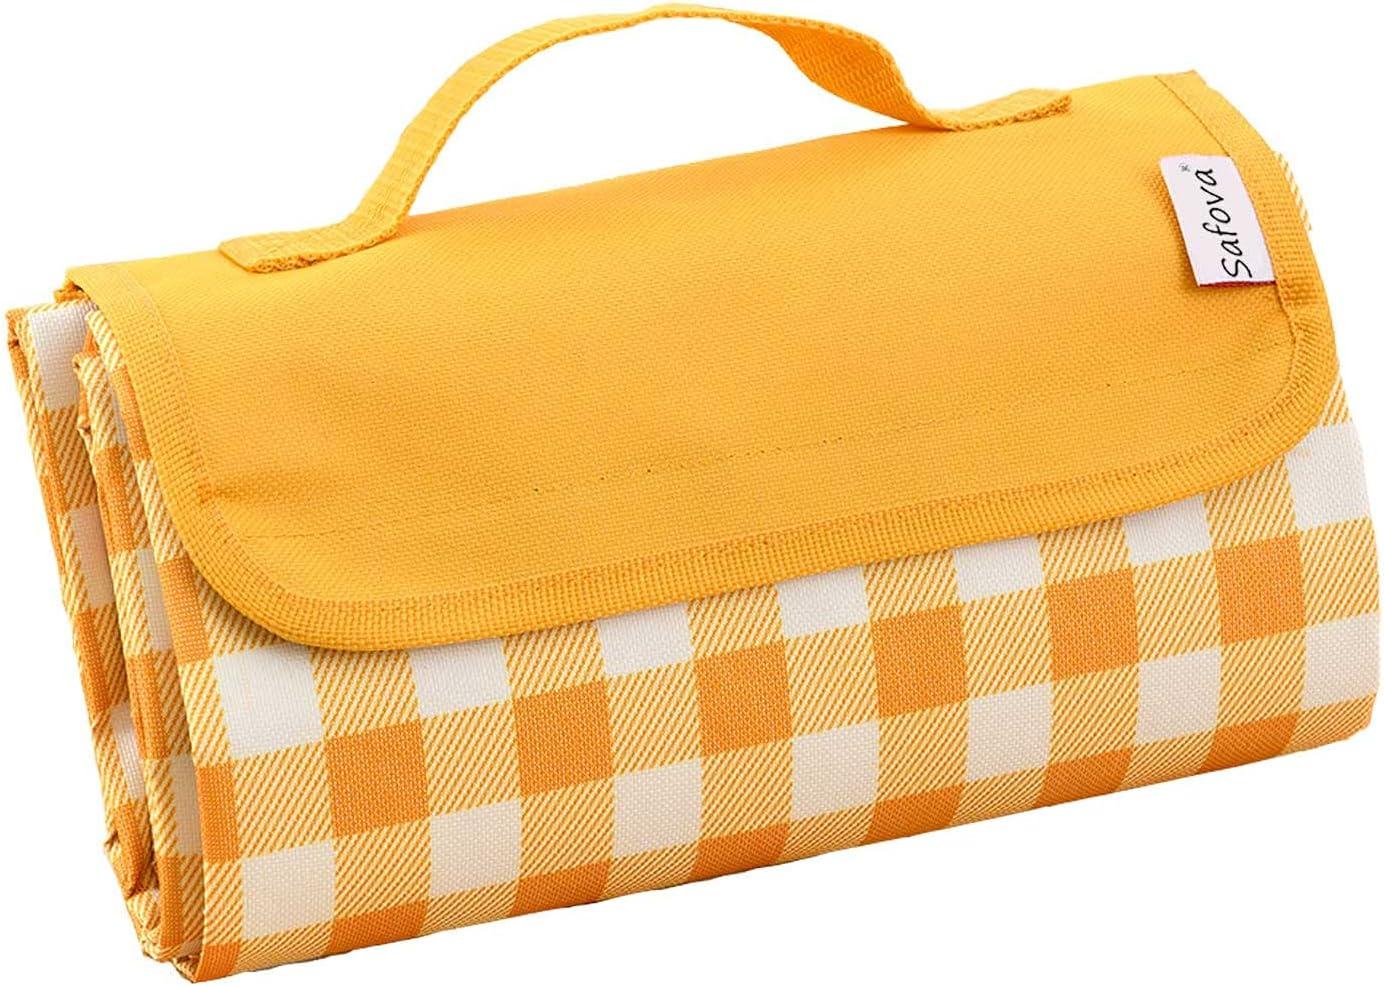 Picnic Blanket 79''x57'' Large Beach Denver Mall Mat f Gifts Sandproof Waterproof